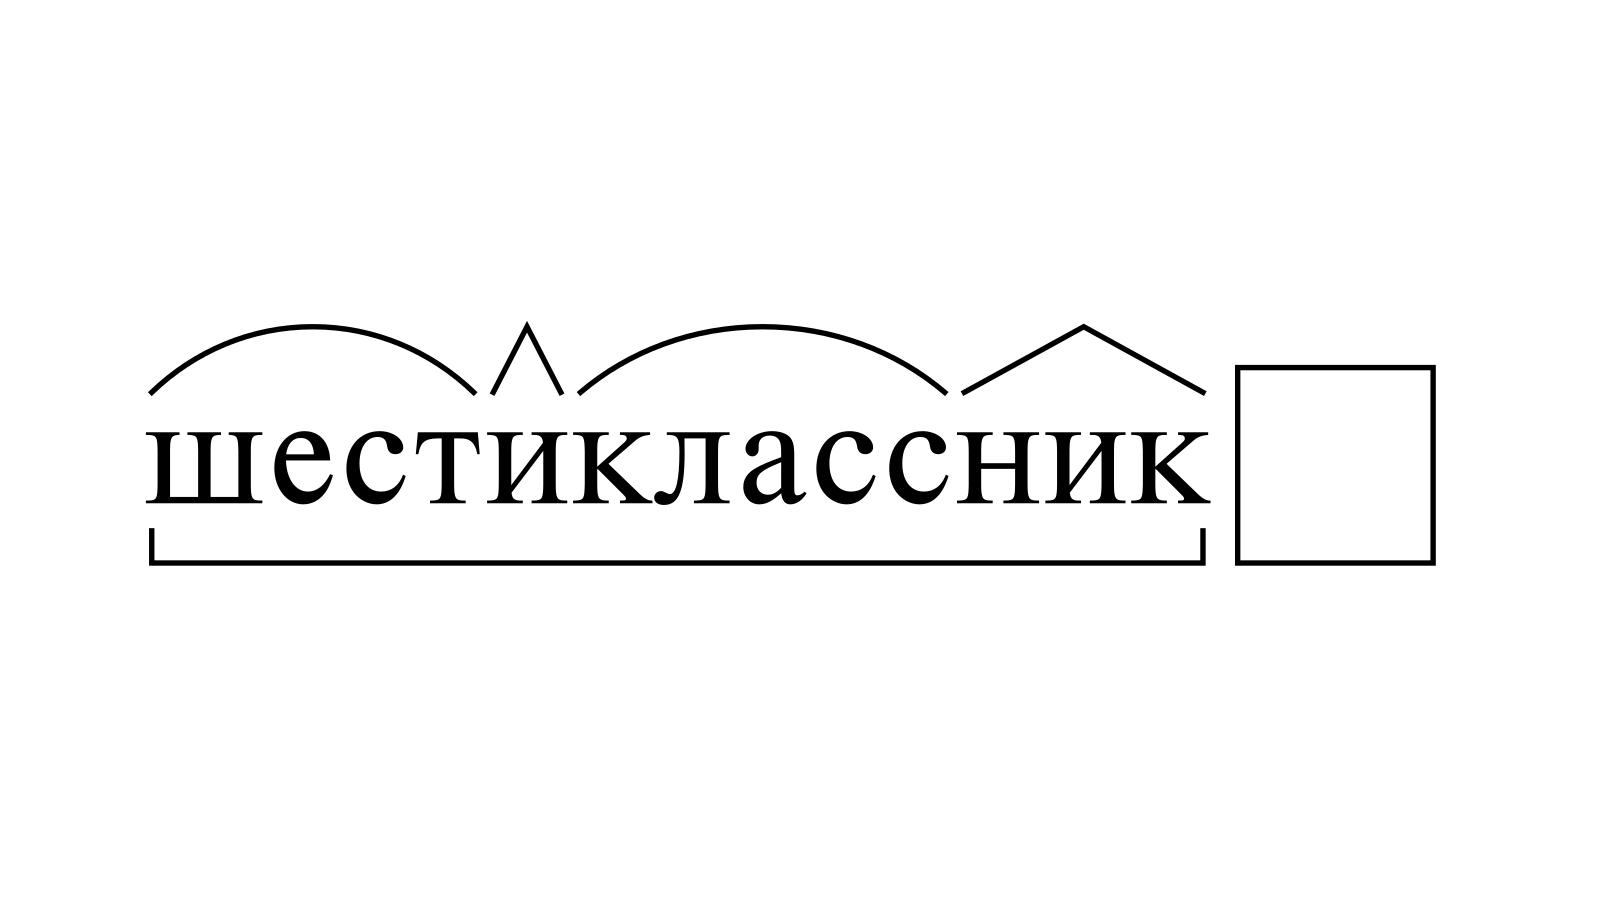 Разбор слова «шестиклассник» по составу